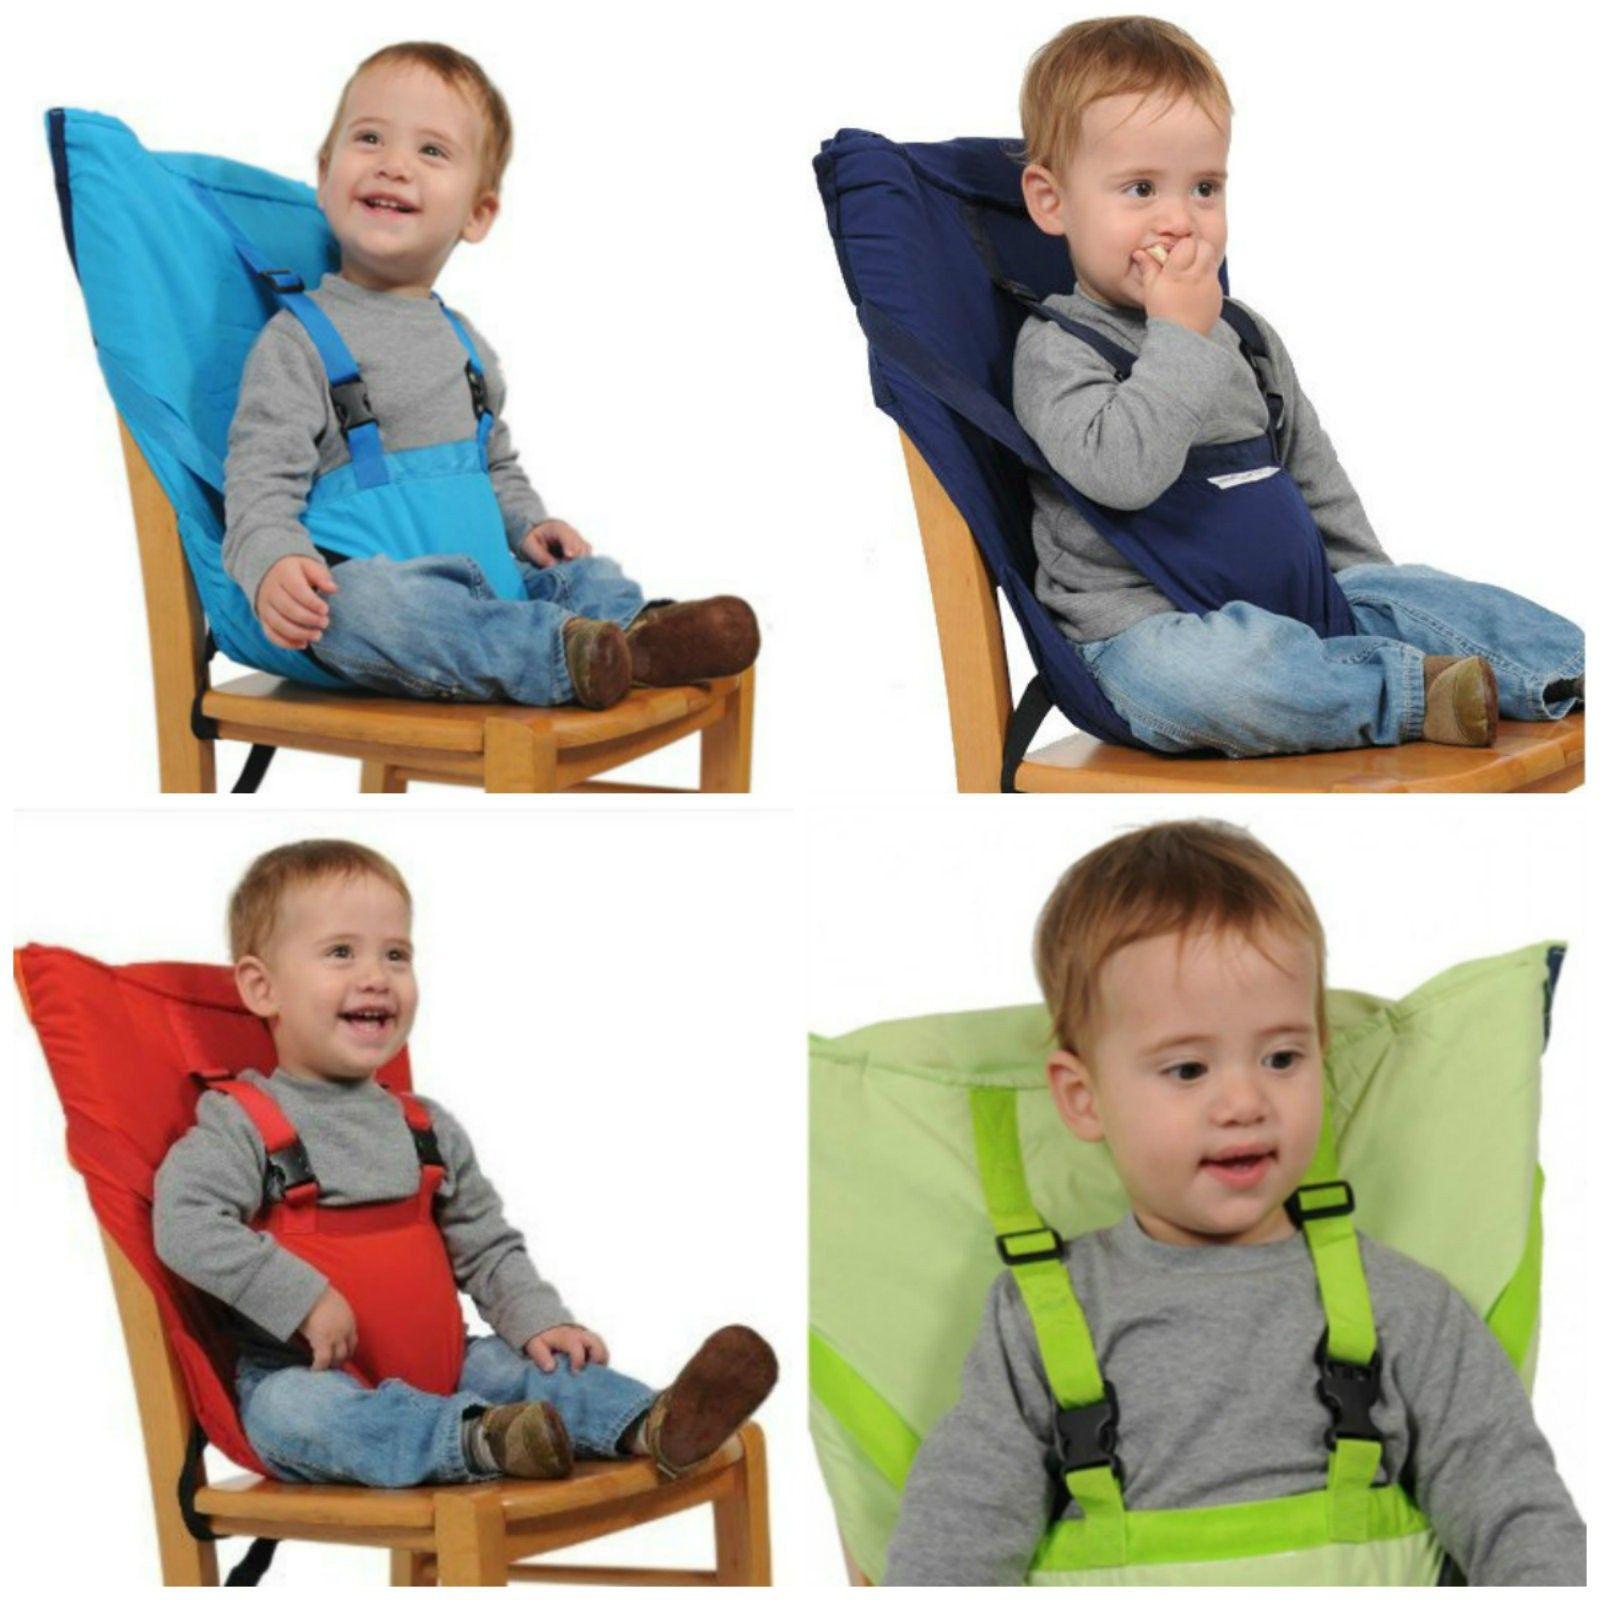 4d688b452b6 Sack n Seat+ Baby Portable High Chair Shoulder Strap